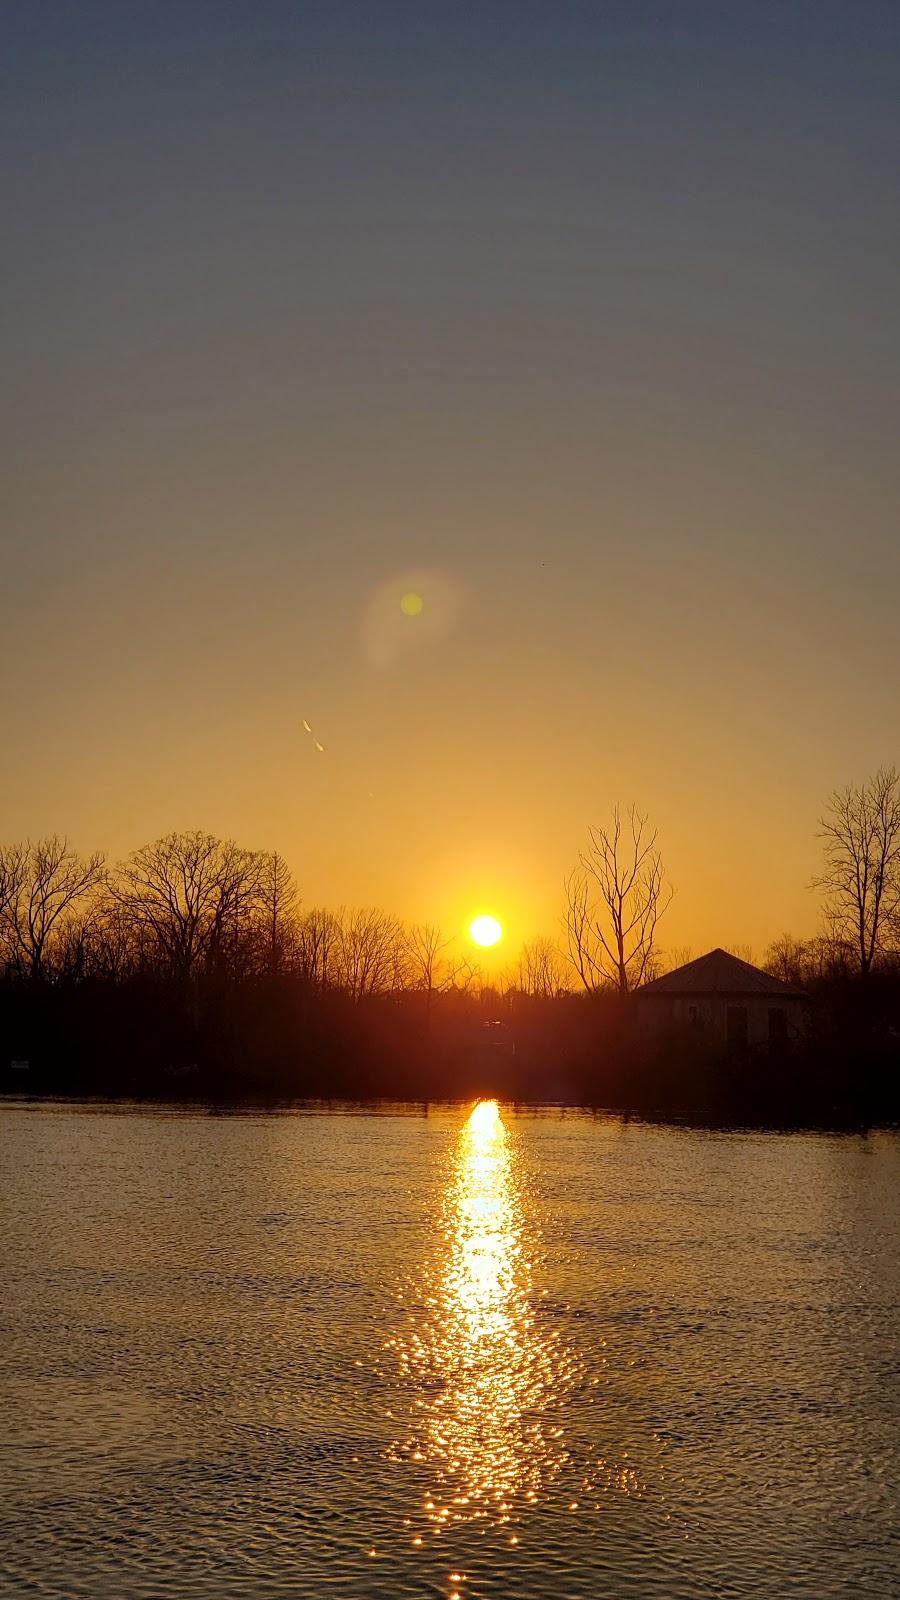 Chippawa Boat Ramp & Naisbitt Parkette - park    Photo 8 of 10   Address: 4379 Lyons Creek Rd, Niagara Falls, ON L2G, Canada, Canada   Phone: (905) 356-7521 ext. 3330